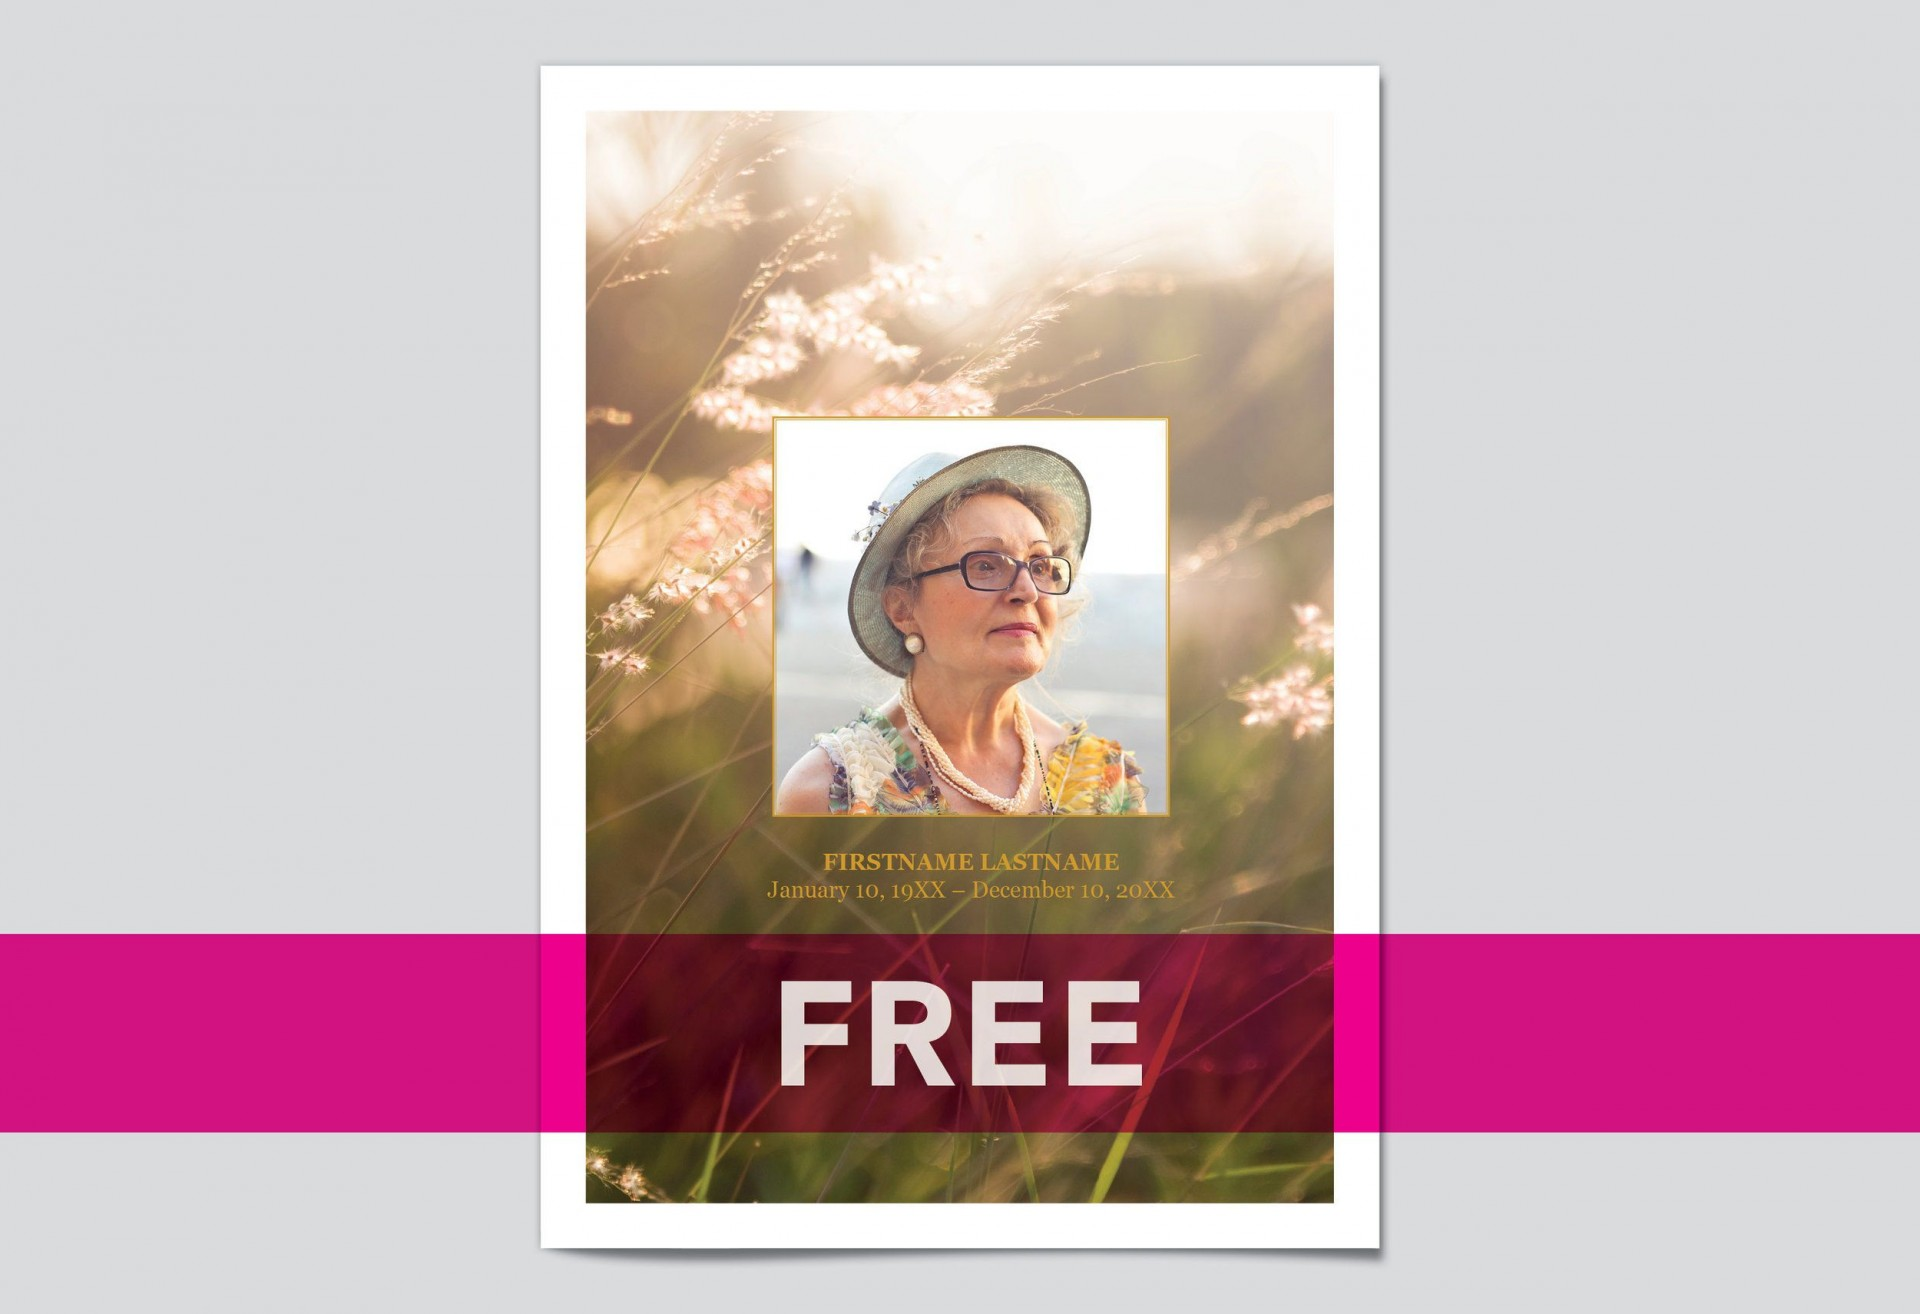 009 Fascinating Celebration Of Life Program Template Free Sample  Editable Word1920